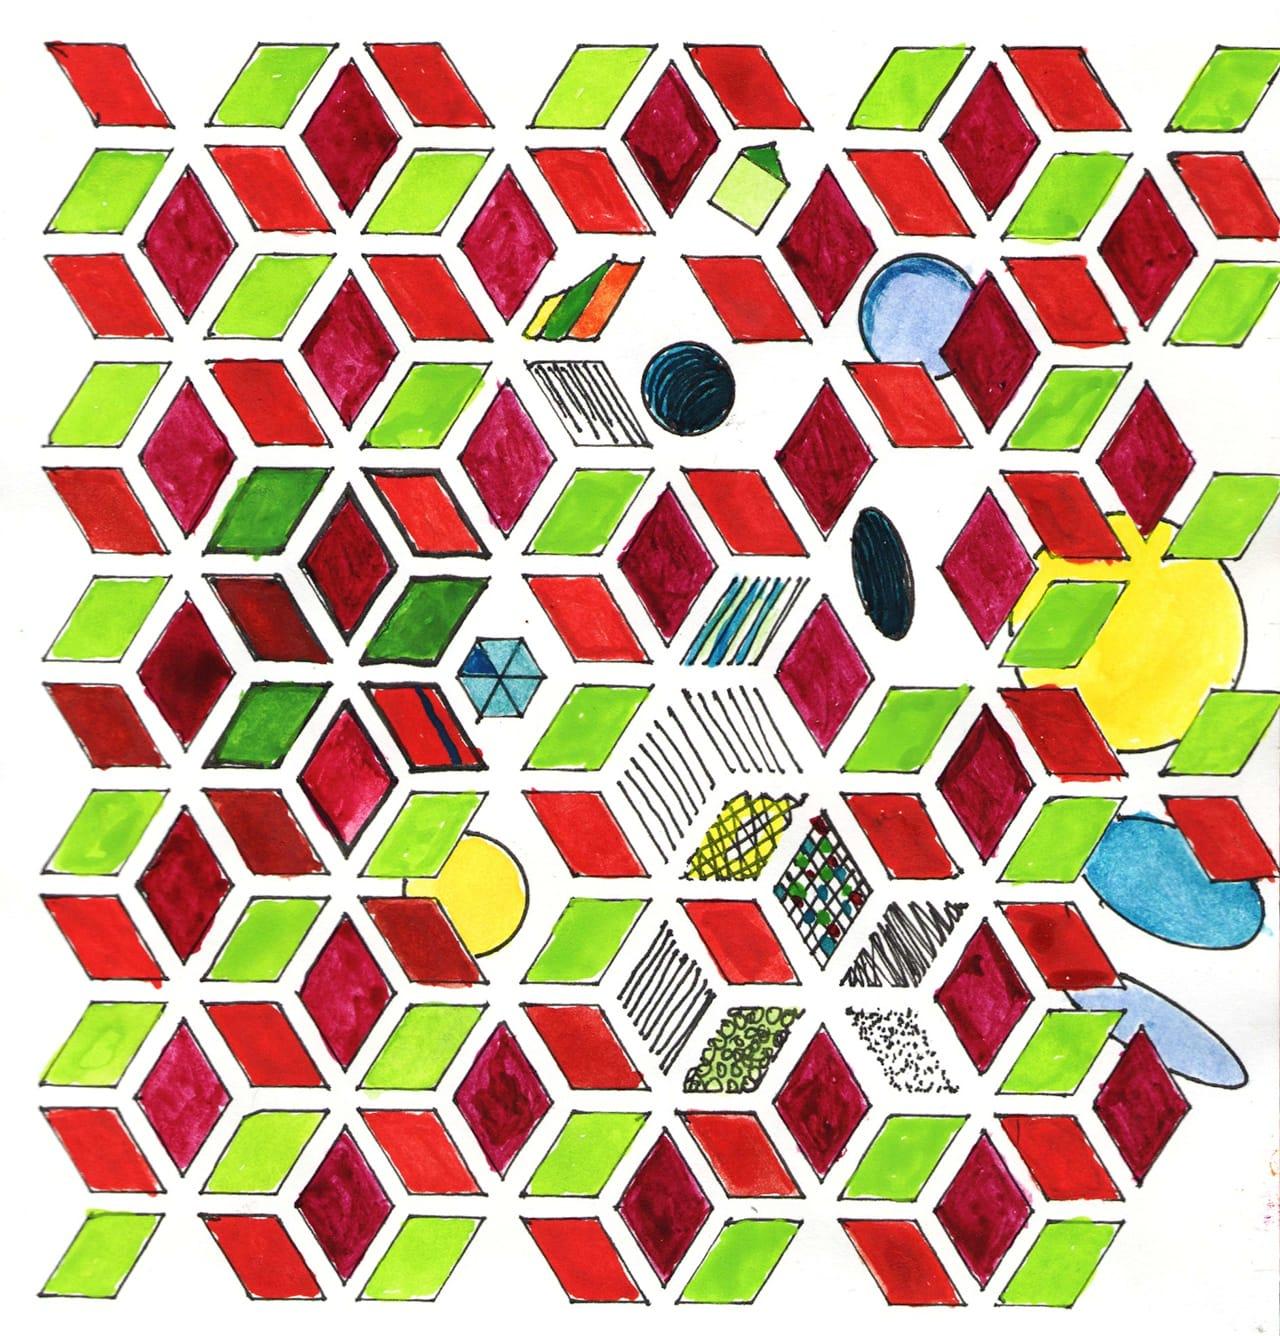 Rhombus apart